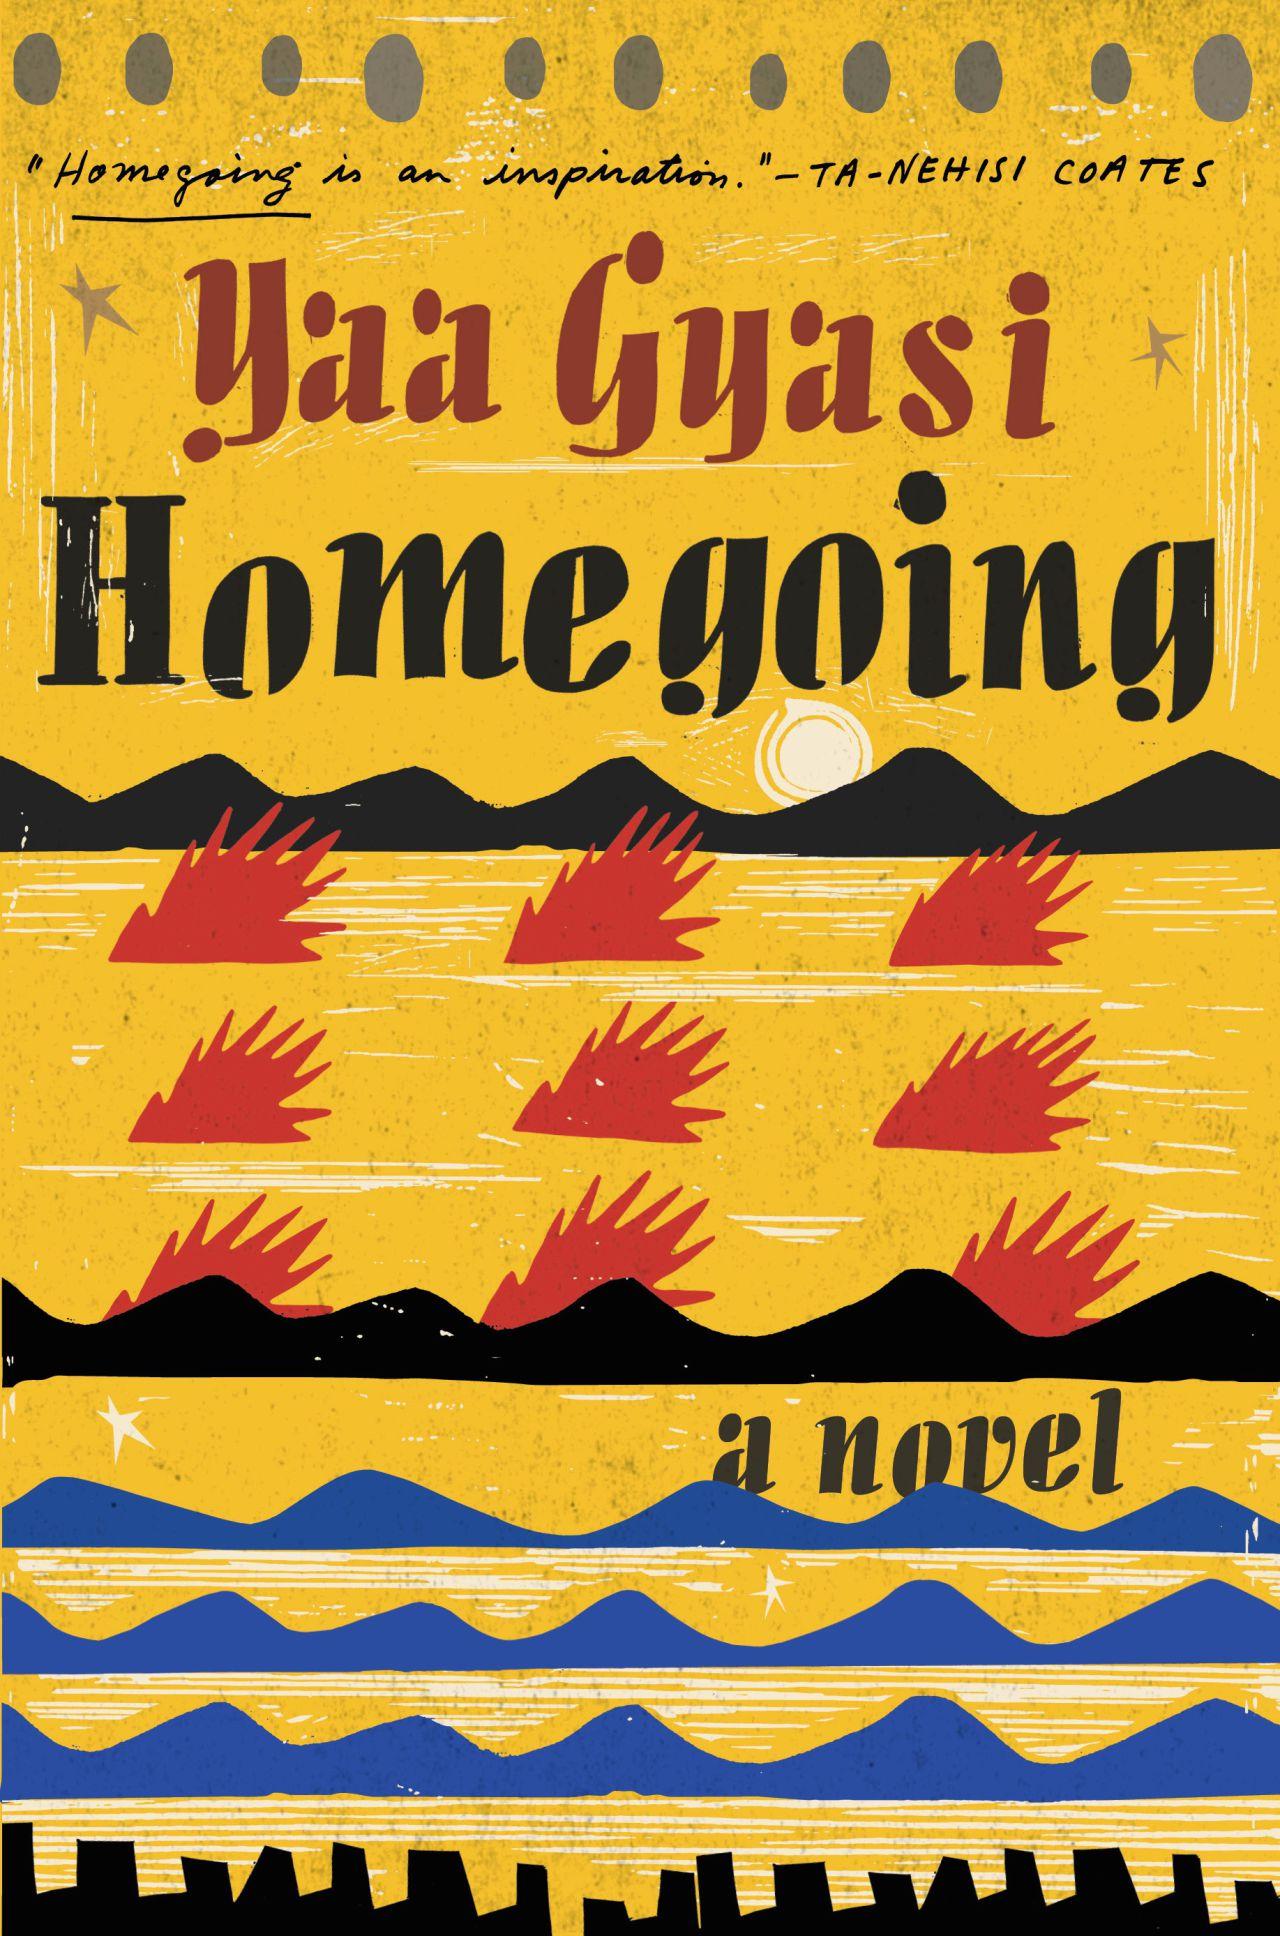 Homegoing by Yaa Gyasi book cover